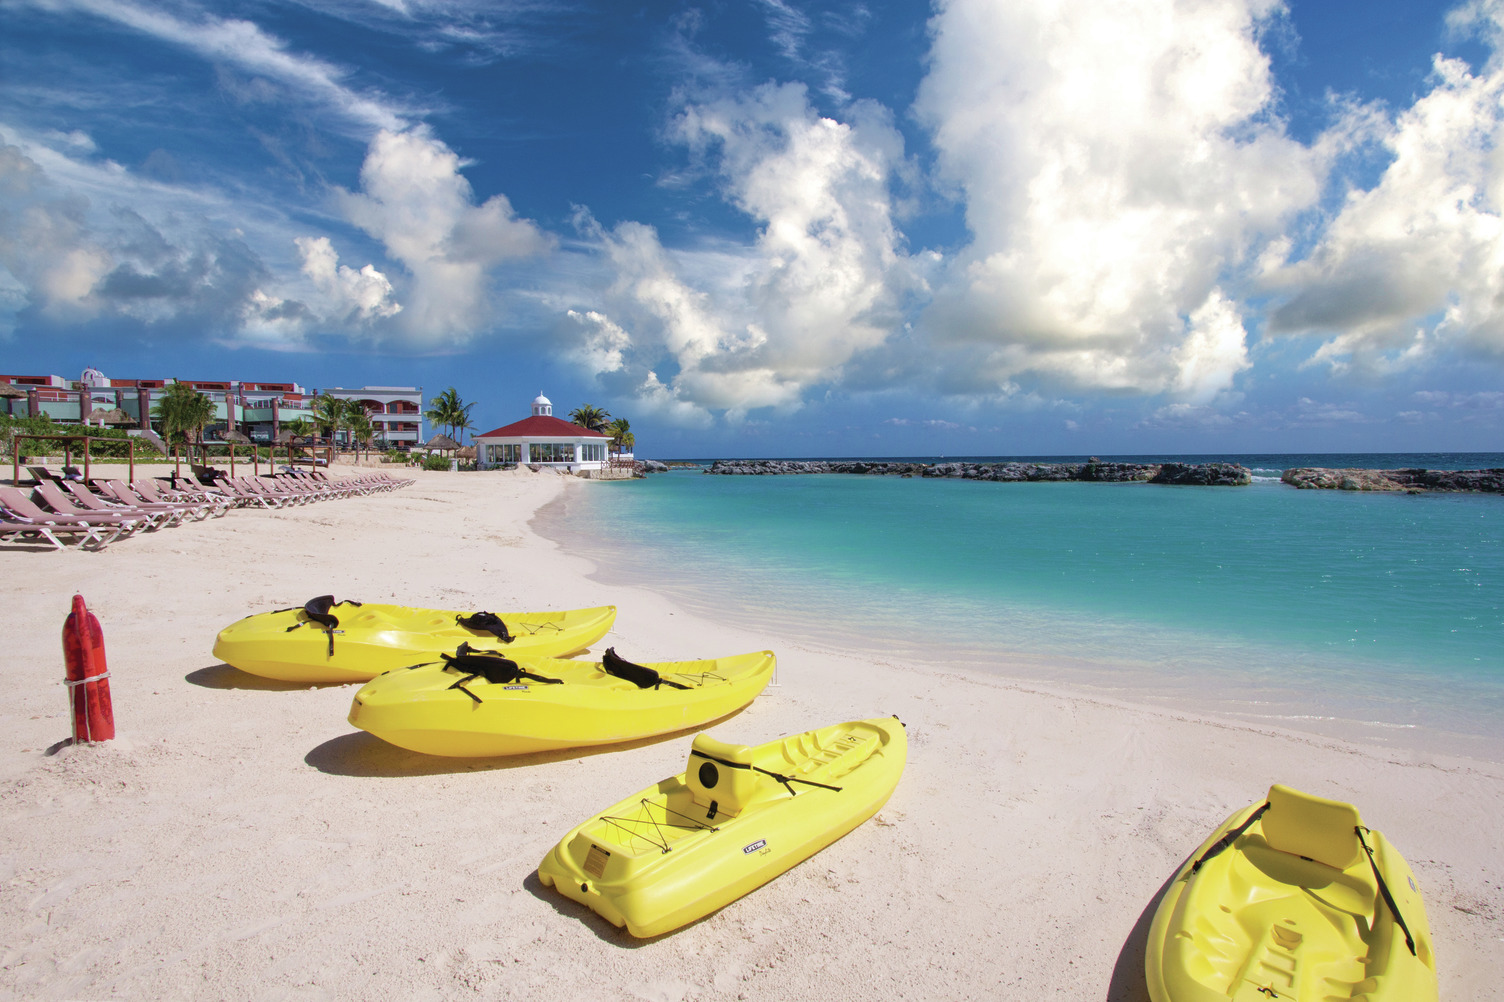 Travel Agency All-Inclusive Resort Heaven at Hard Rock Hotel Riviera Maya 09